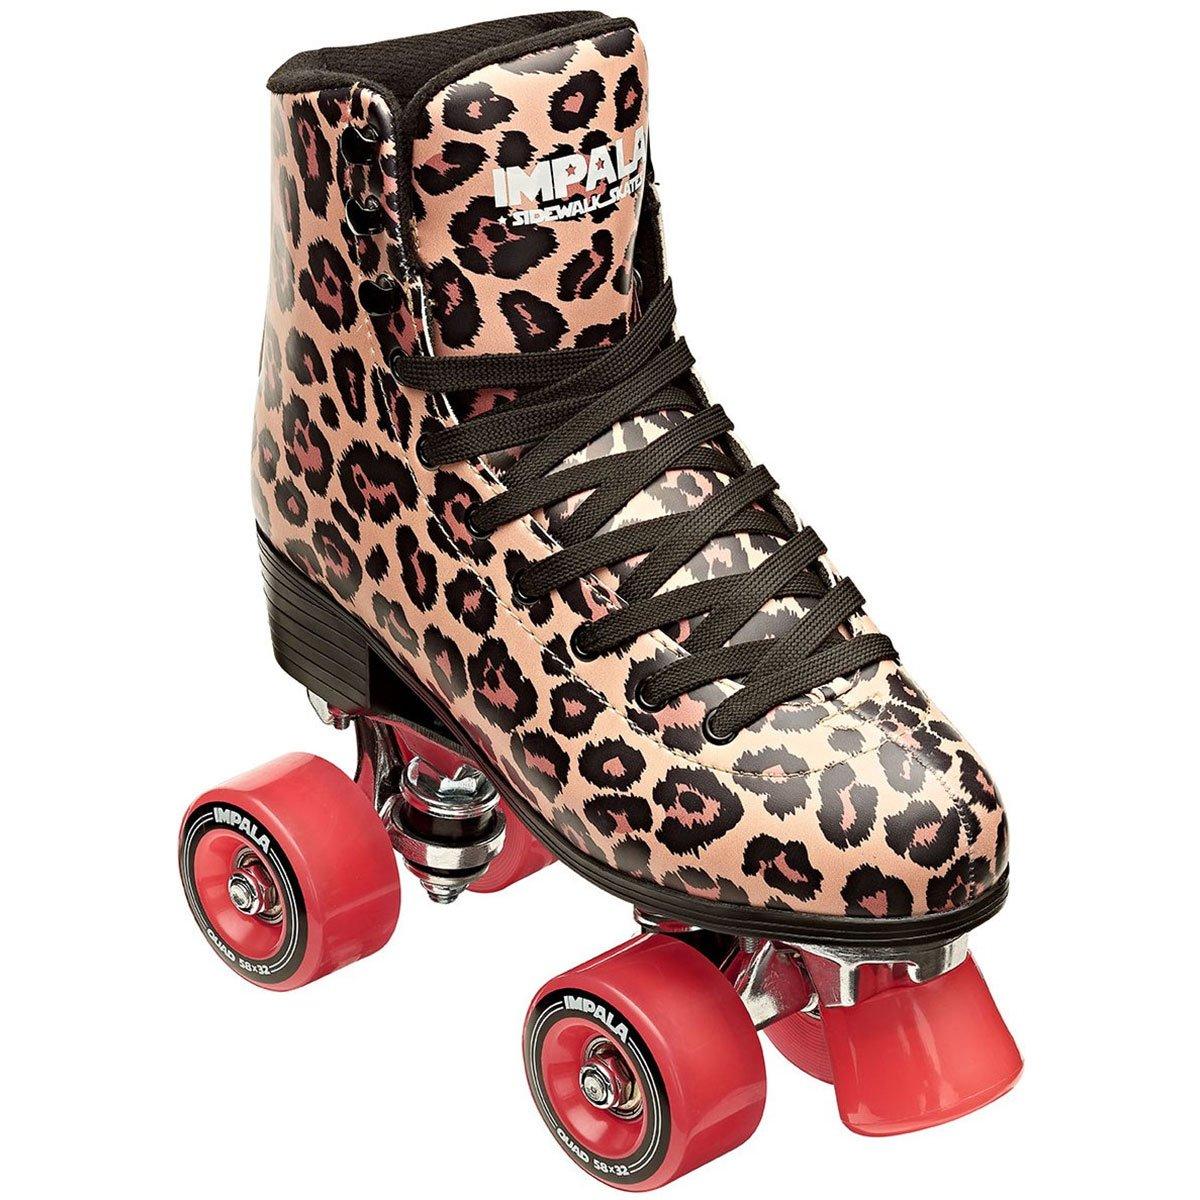 Impala Sidewalk Womens Roller Skates - Leopard/Red - 9